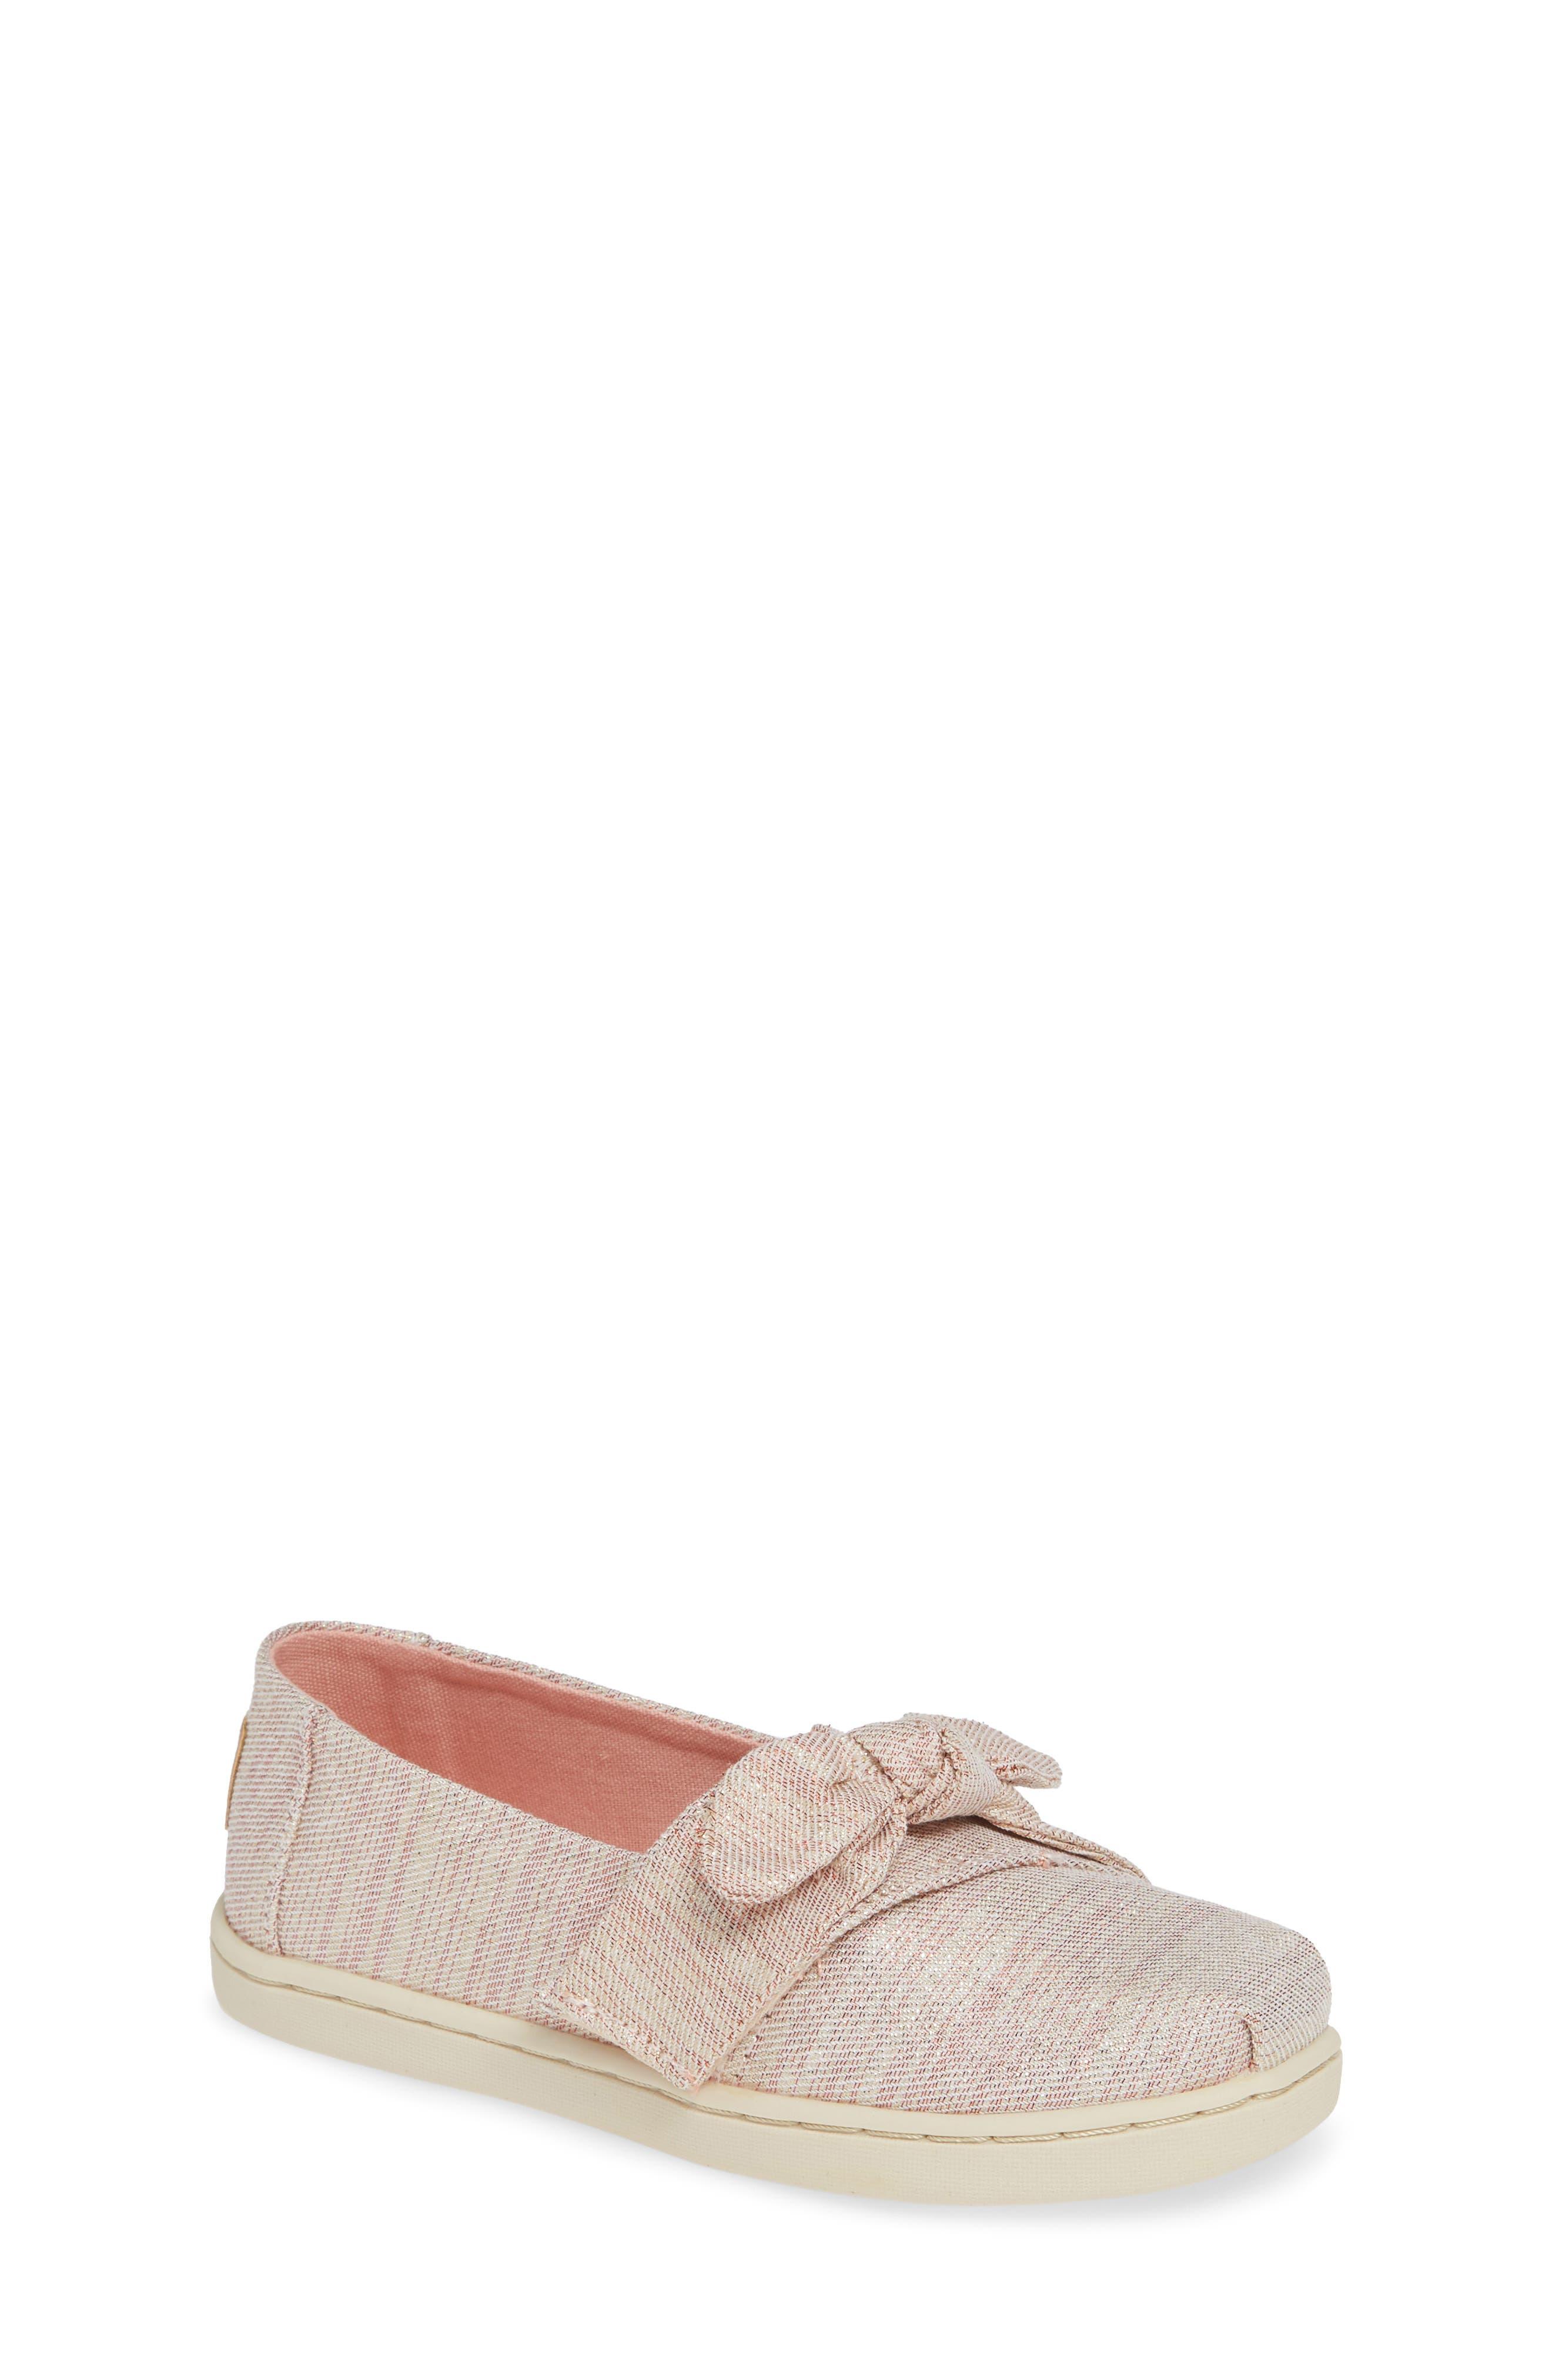 Toddler Girls Toms Tiny Bow Alpargata SlipOn Size 9 M  Pink